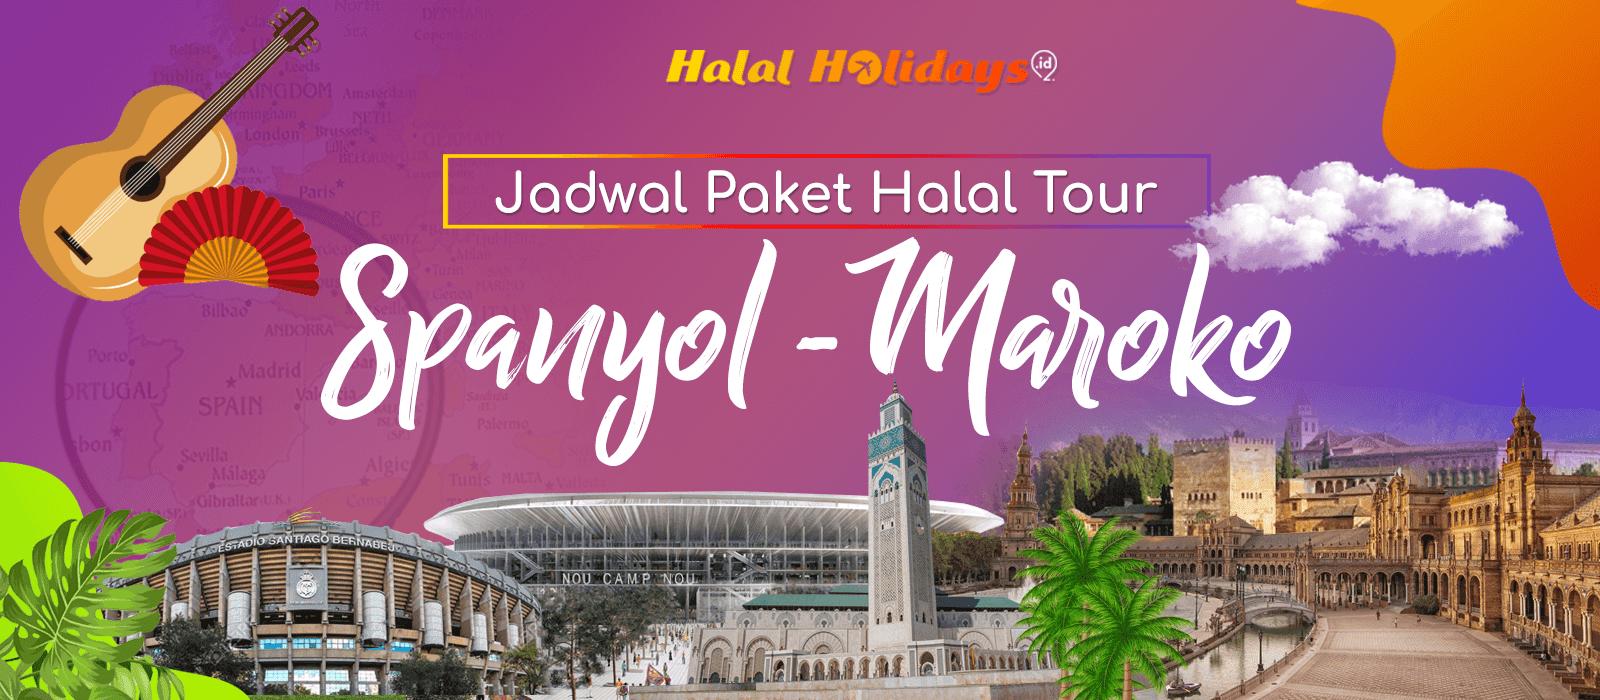 Paket Wisata Halal Tour Spanyol Maroko Murah Tahun 2020